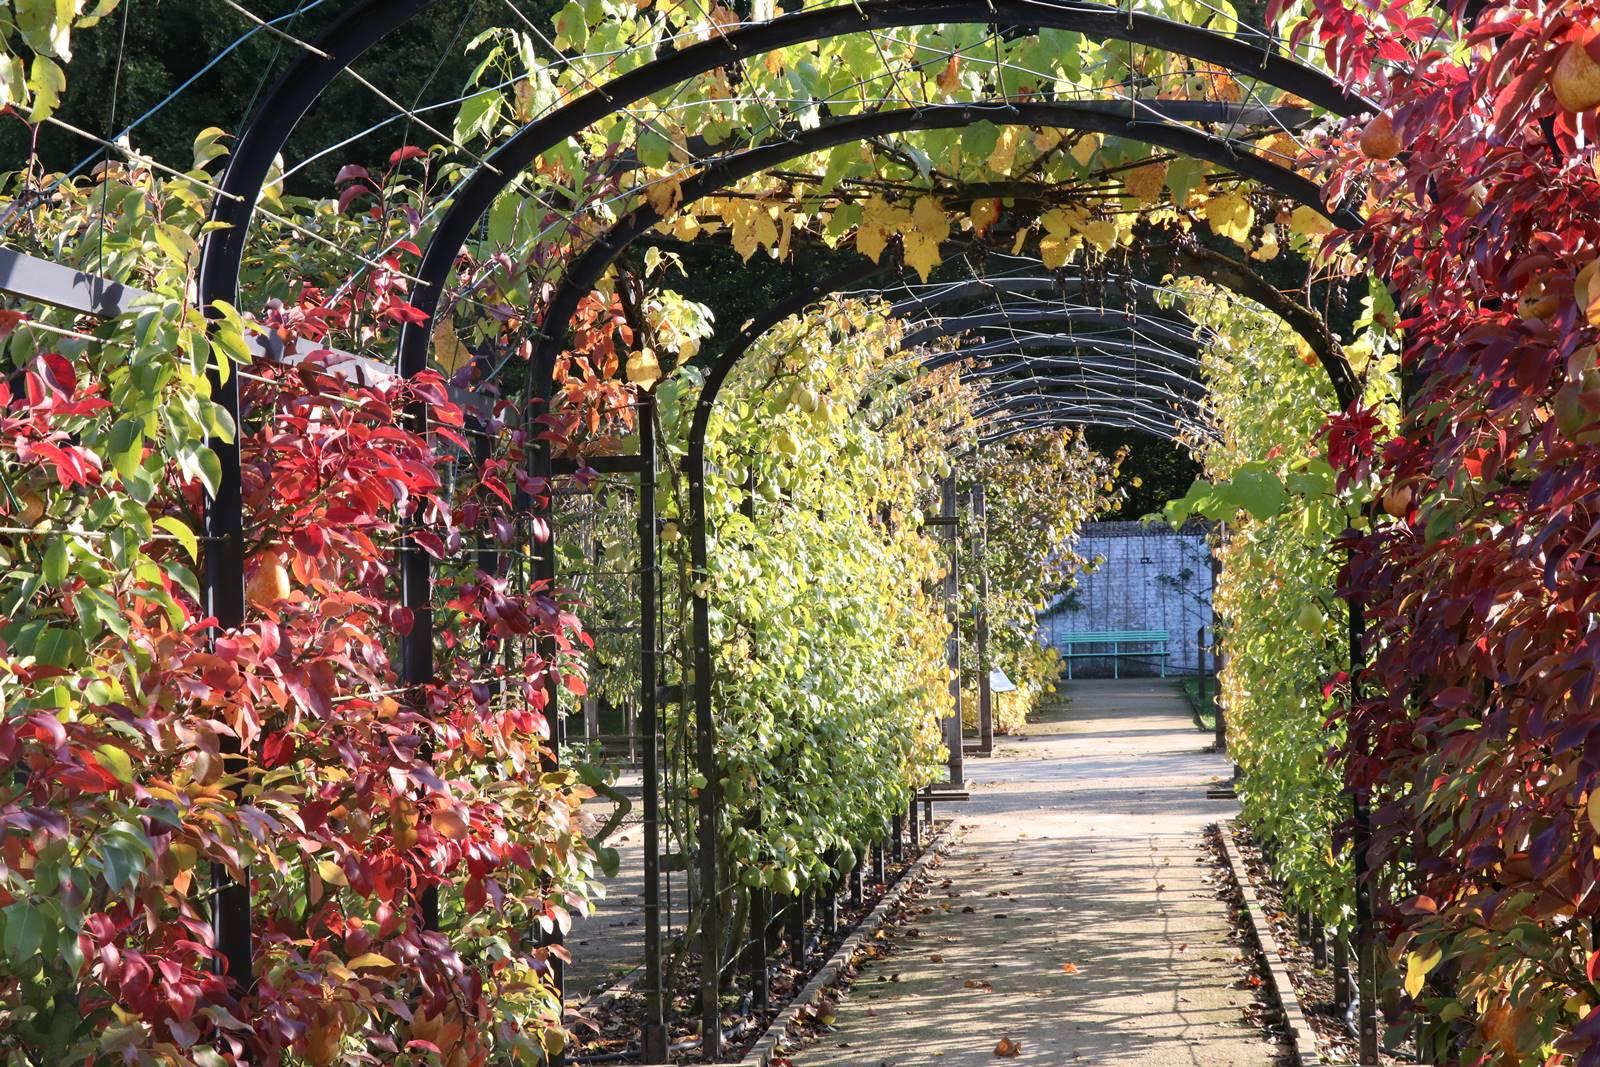 Jardin musée de Gaasbeek